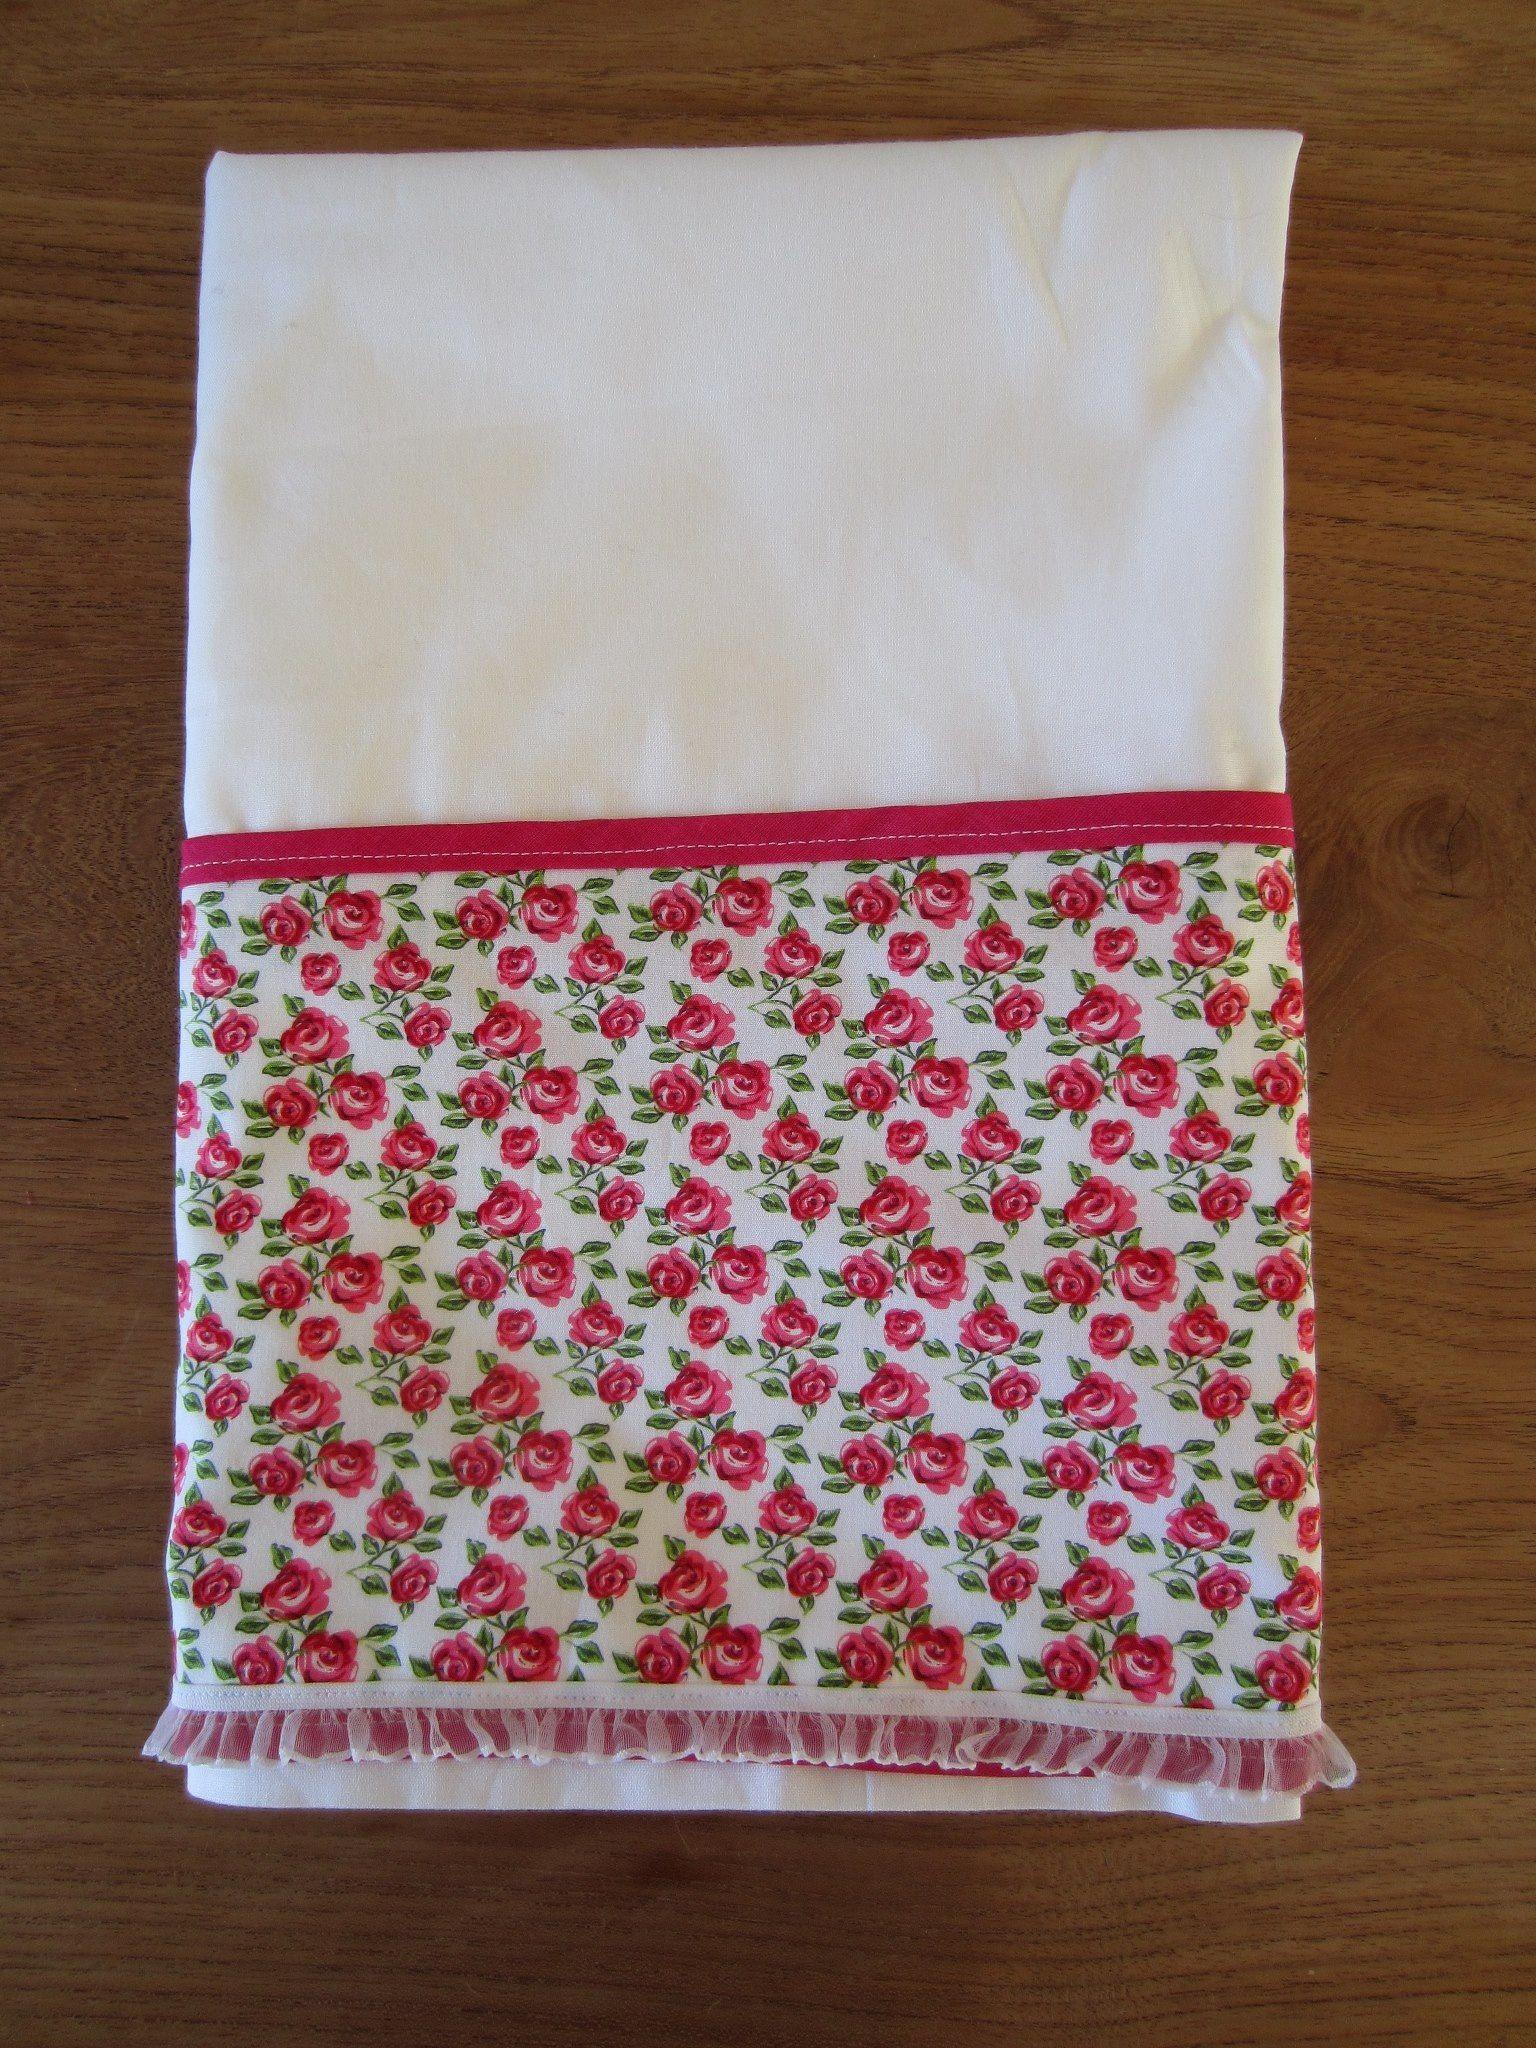 Babybed opmaken zomer - Lakentje Voor Een Wieg Sheet For A Crib Www Knutselkoningin Nl